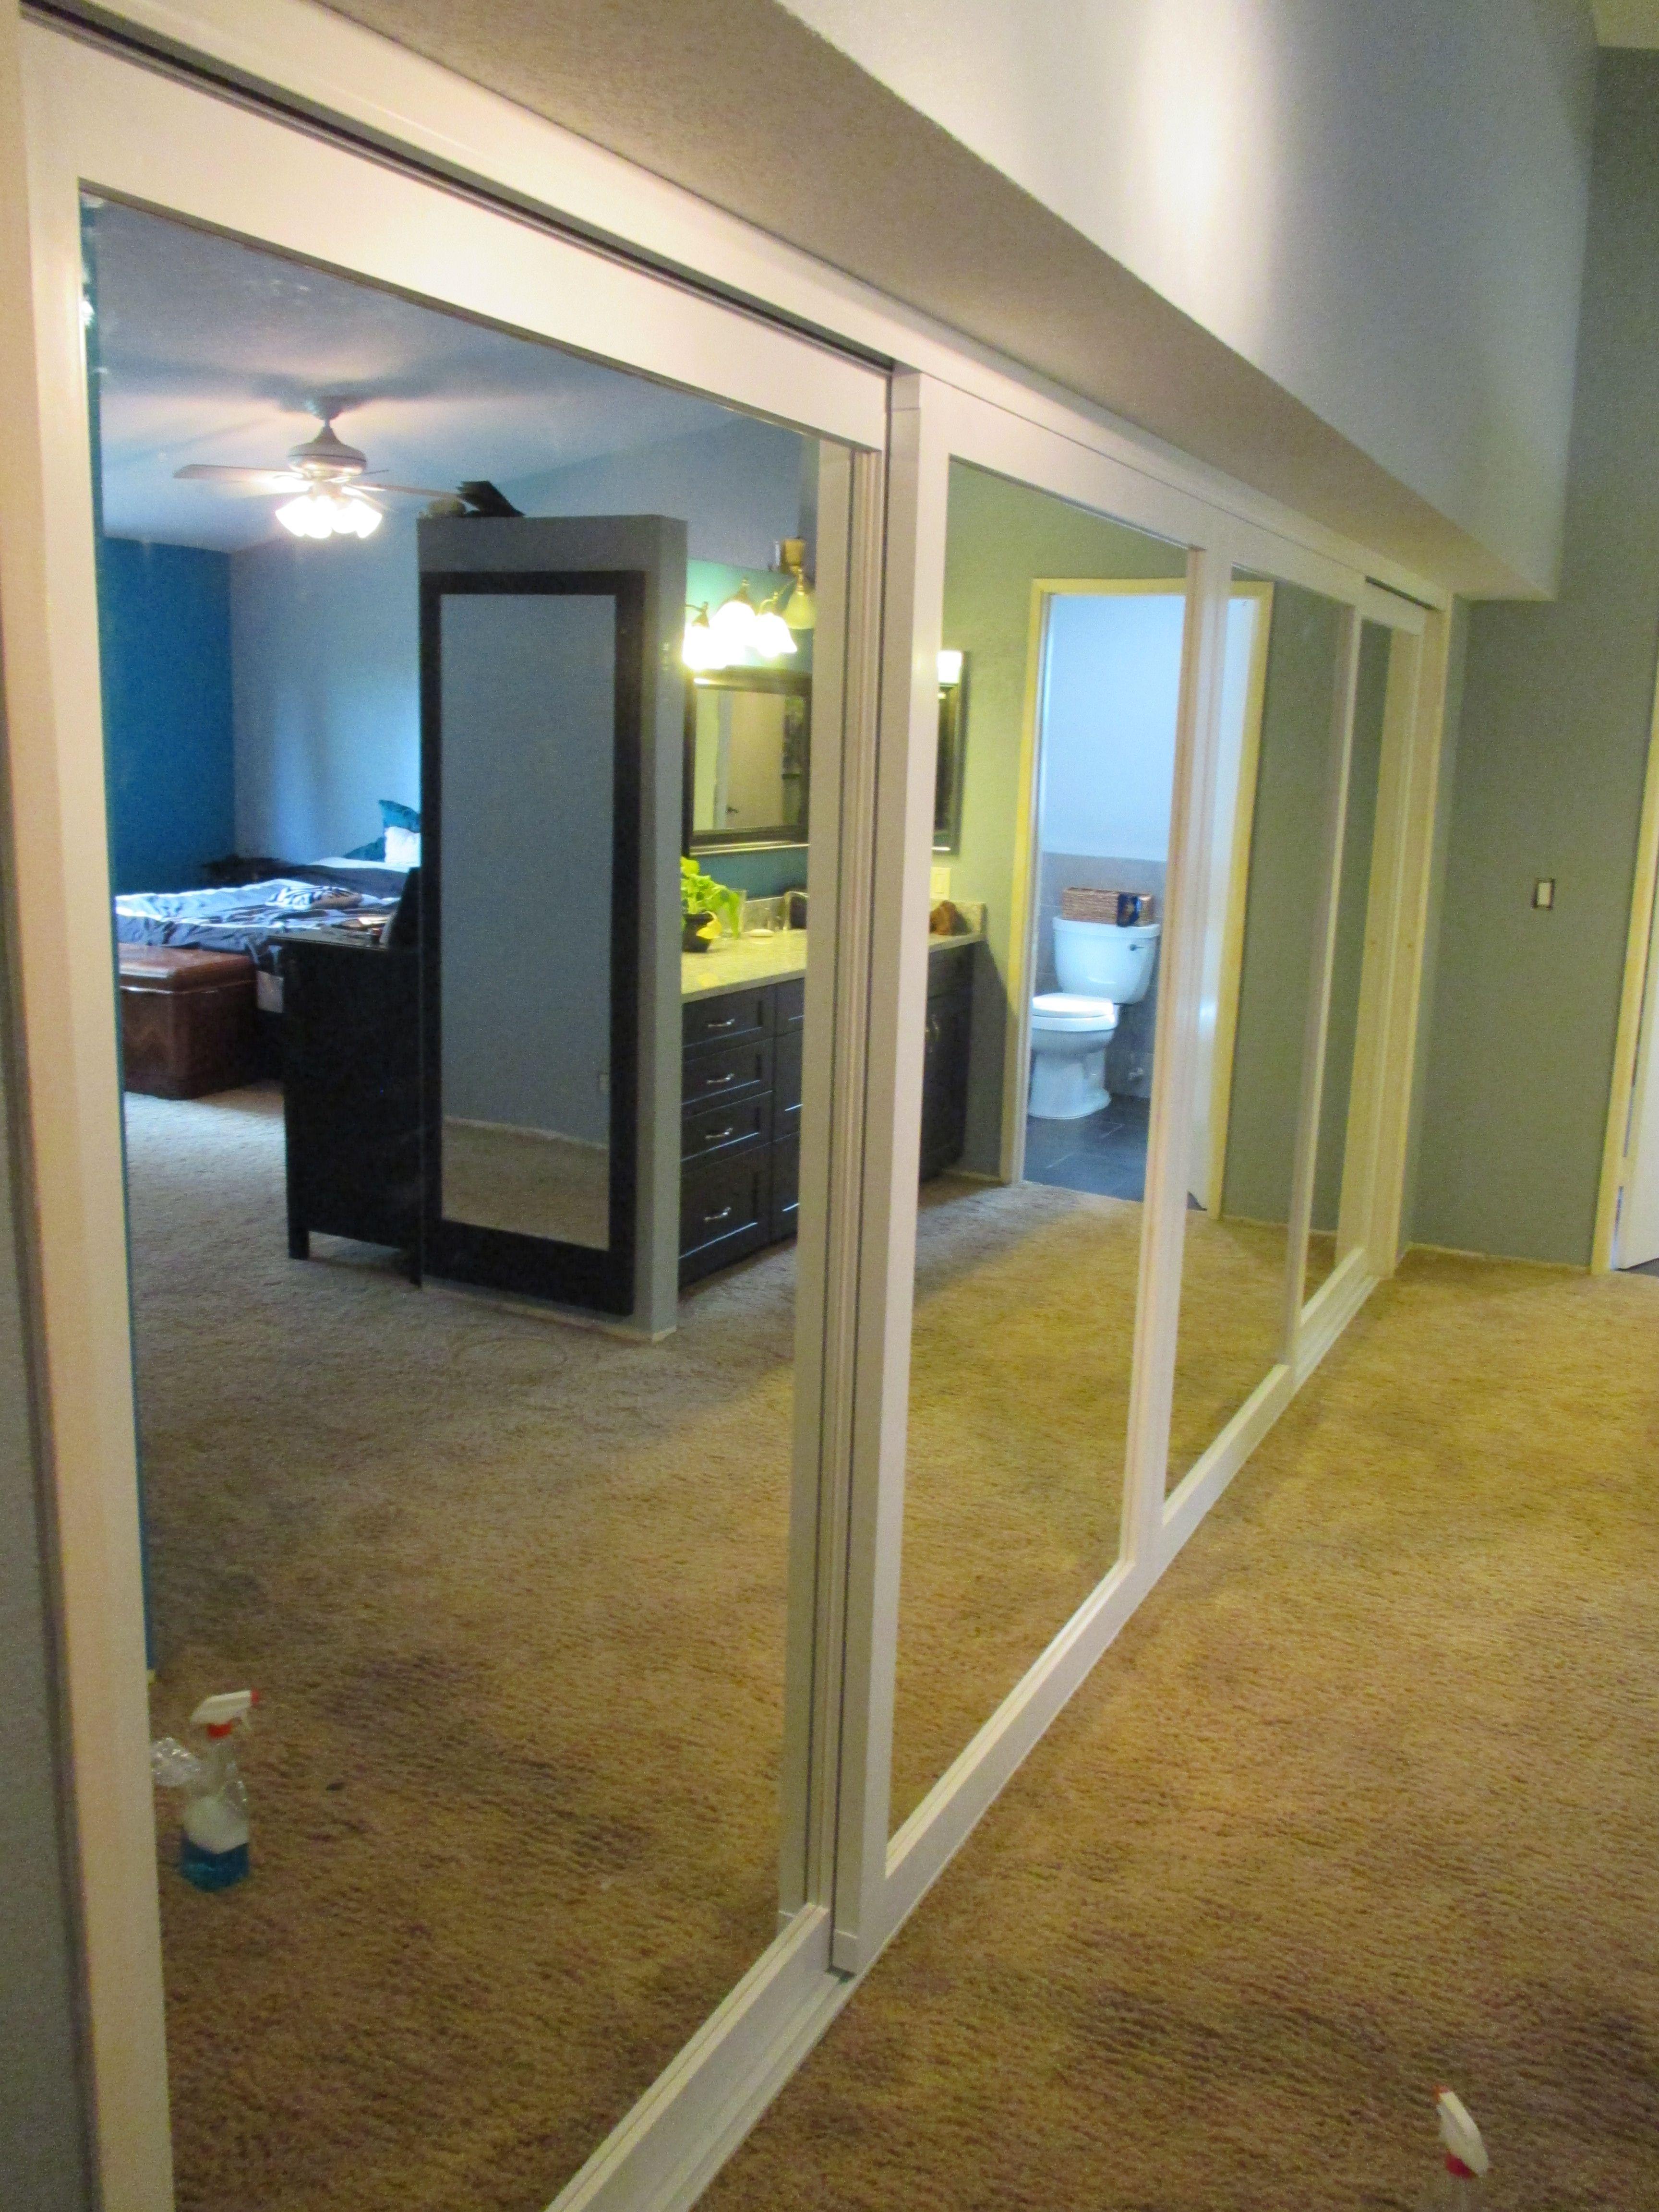 4 Panel 4 Track Wood Frame Sliding Bottom Roller Closet Doors